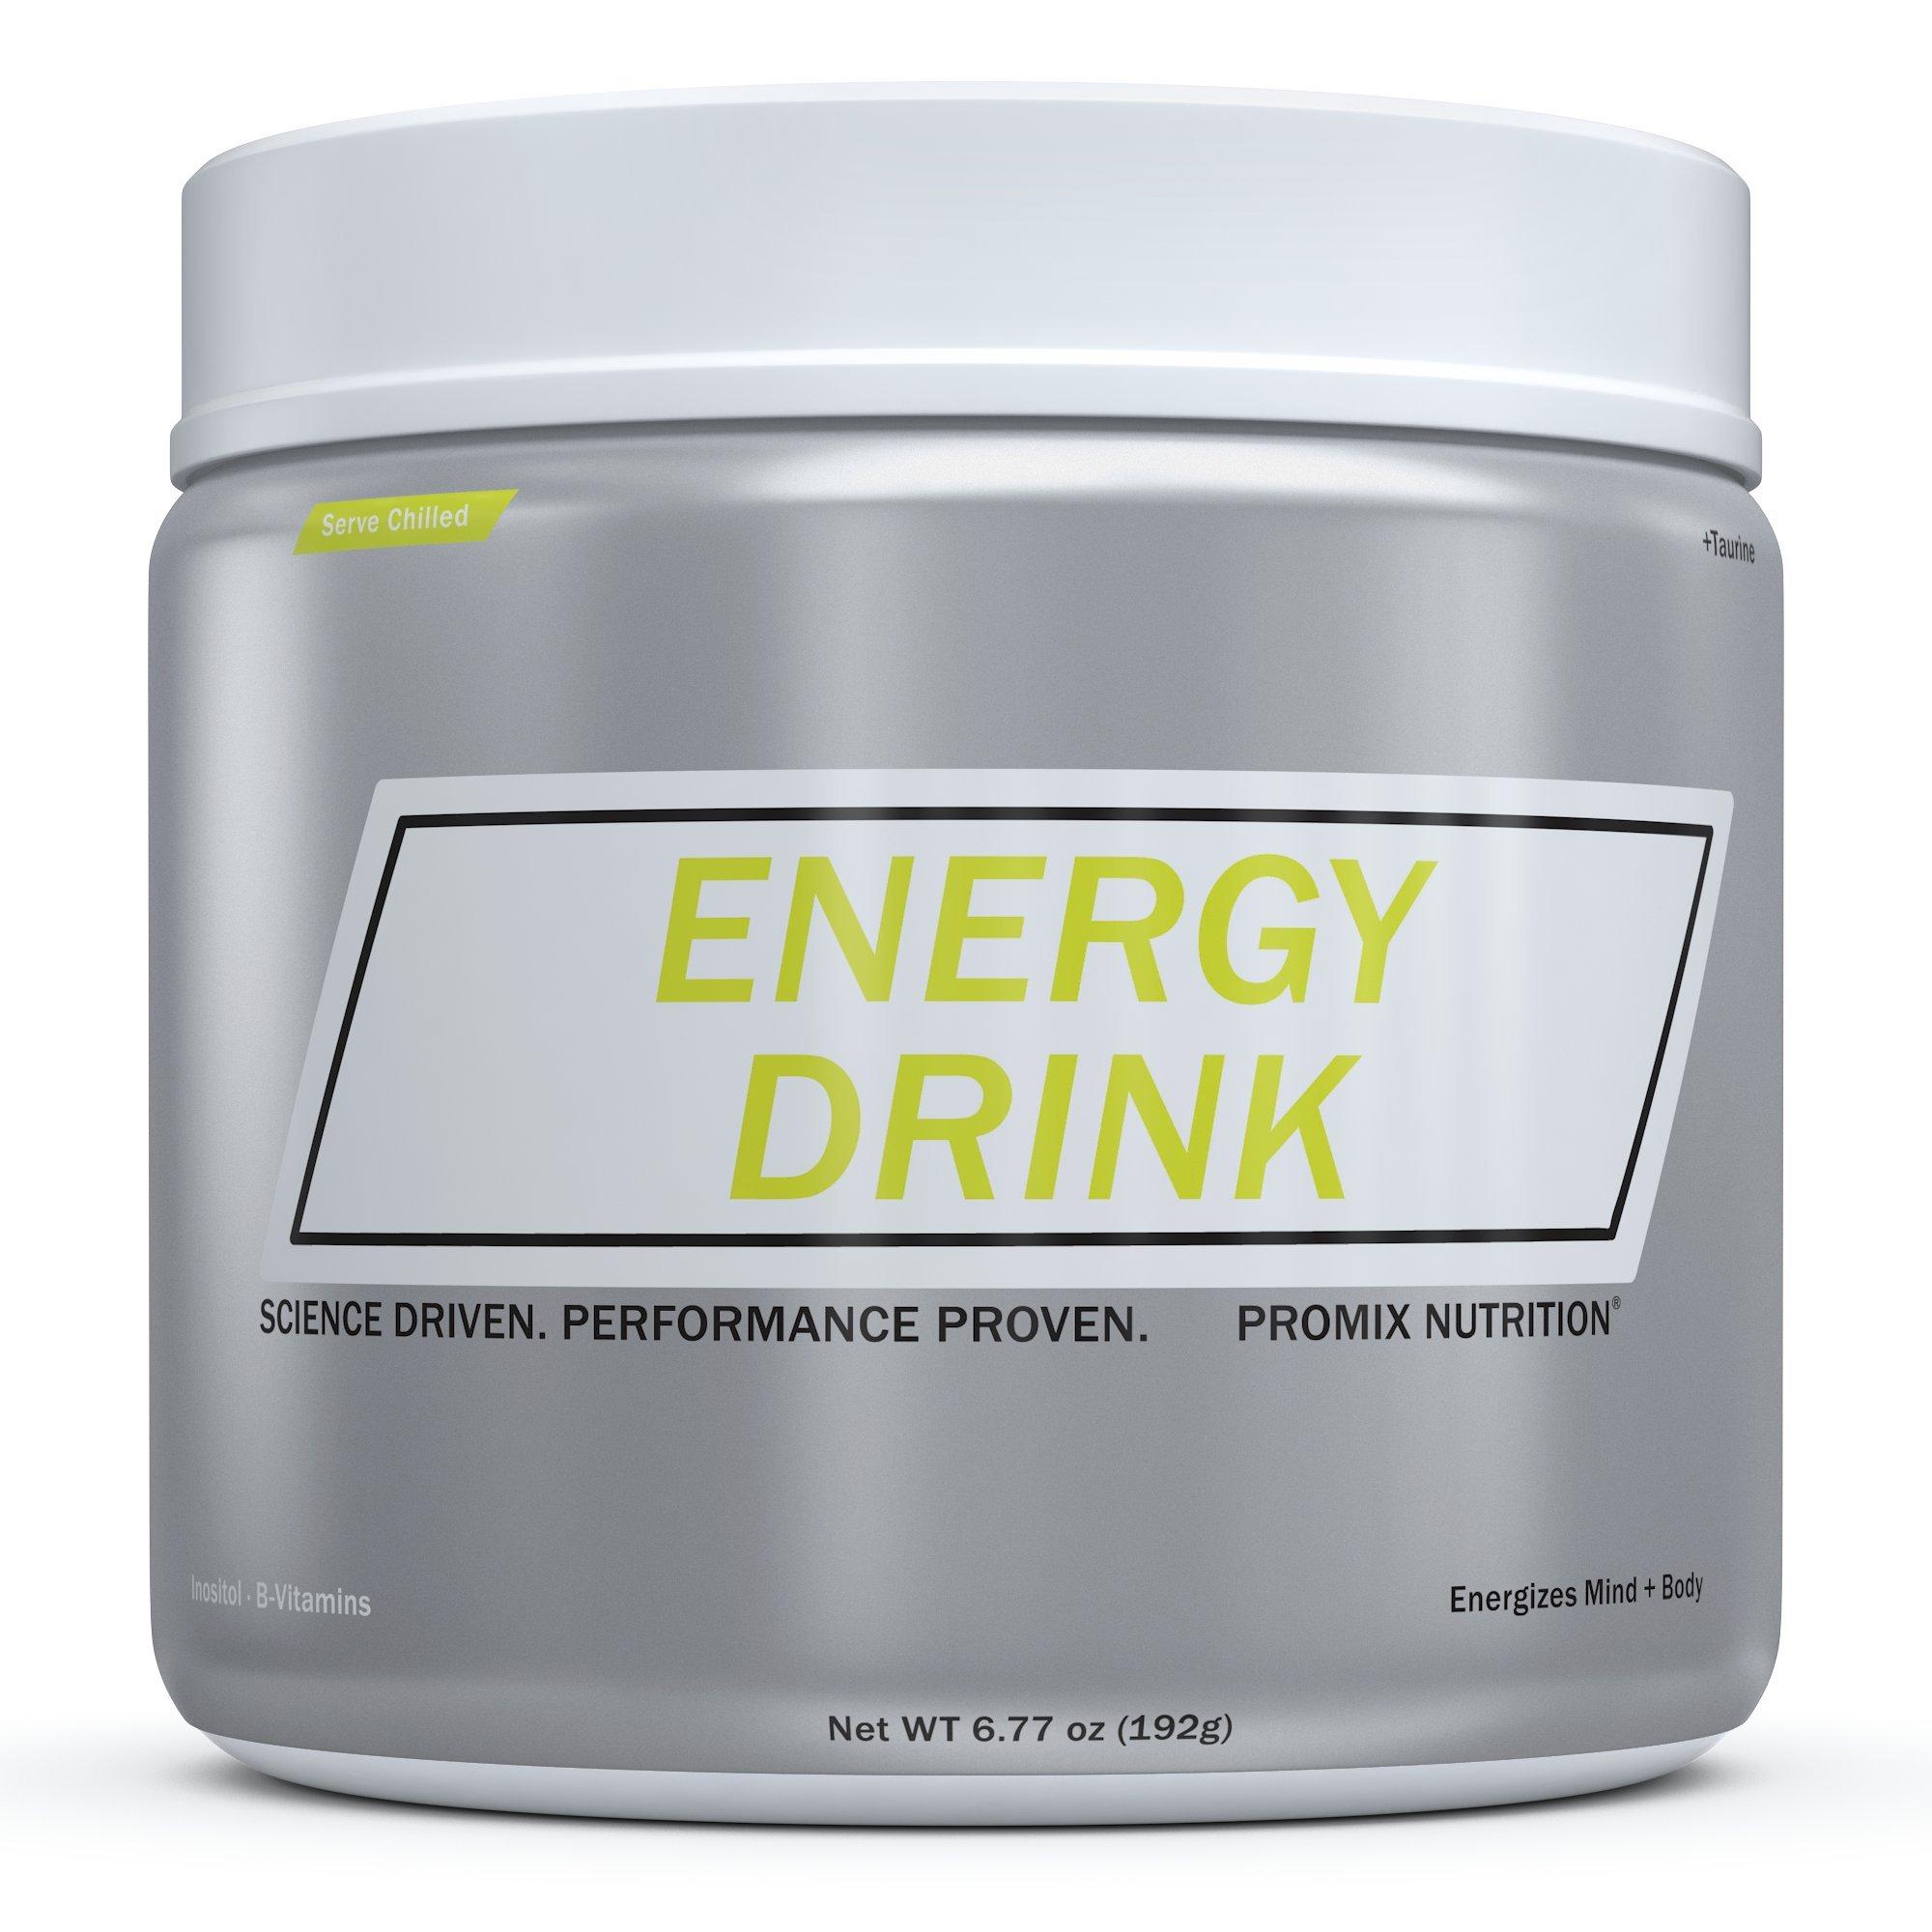 Pre Workout Powder Energy Focus Keto 100% PROMIX Performance I Men & Women Beta Alanine Taurine Tyrosine Vitamin B12 Weight Fat Loss Blast No Crash Tested Gluten Soy Free, Drink (Energy Drink)